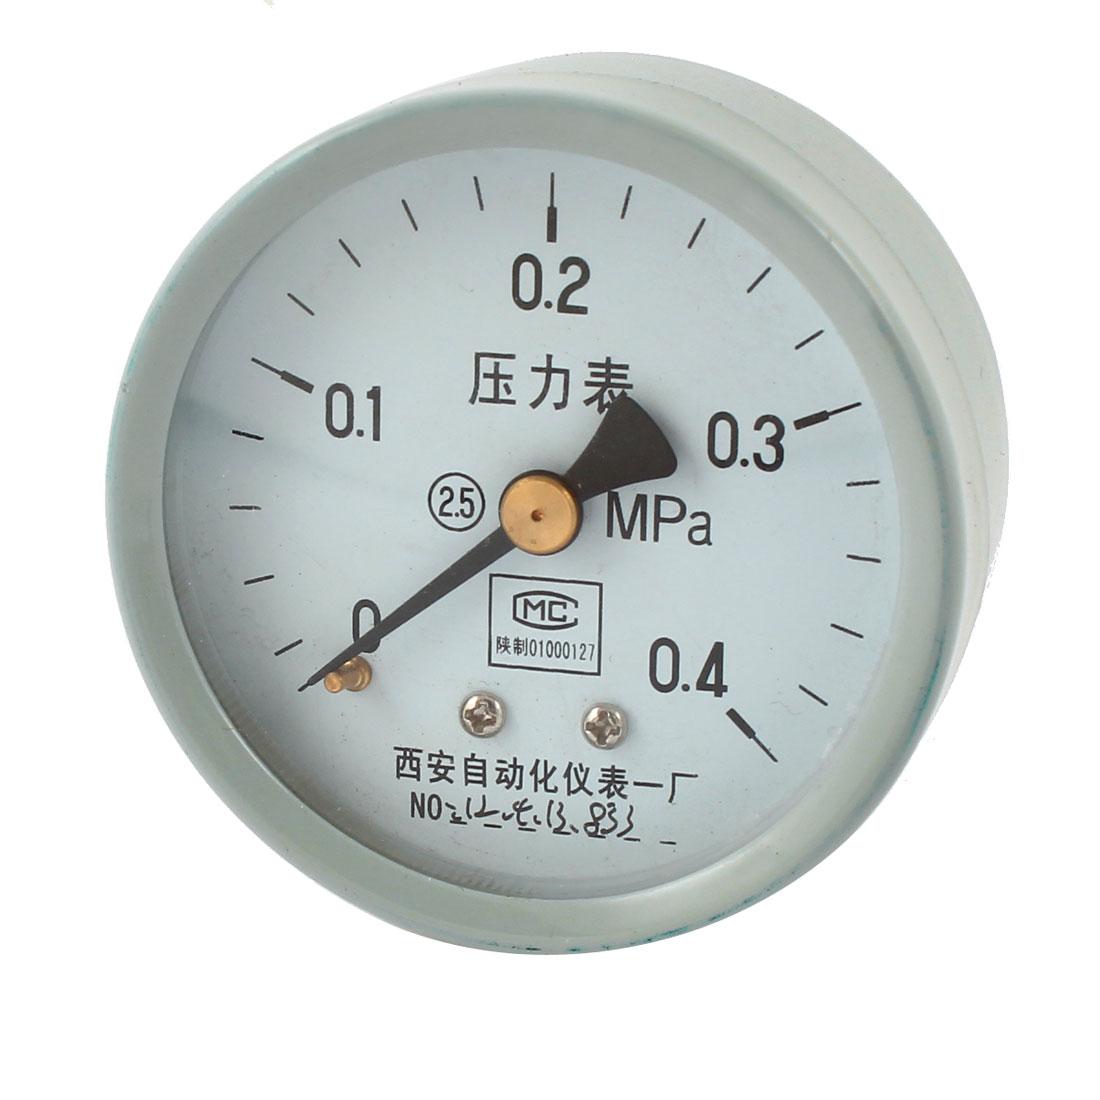 1/4PT Threaded 0-0.4Mpa Arabic Number Display Air Pressure Measuring Gauge